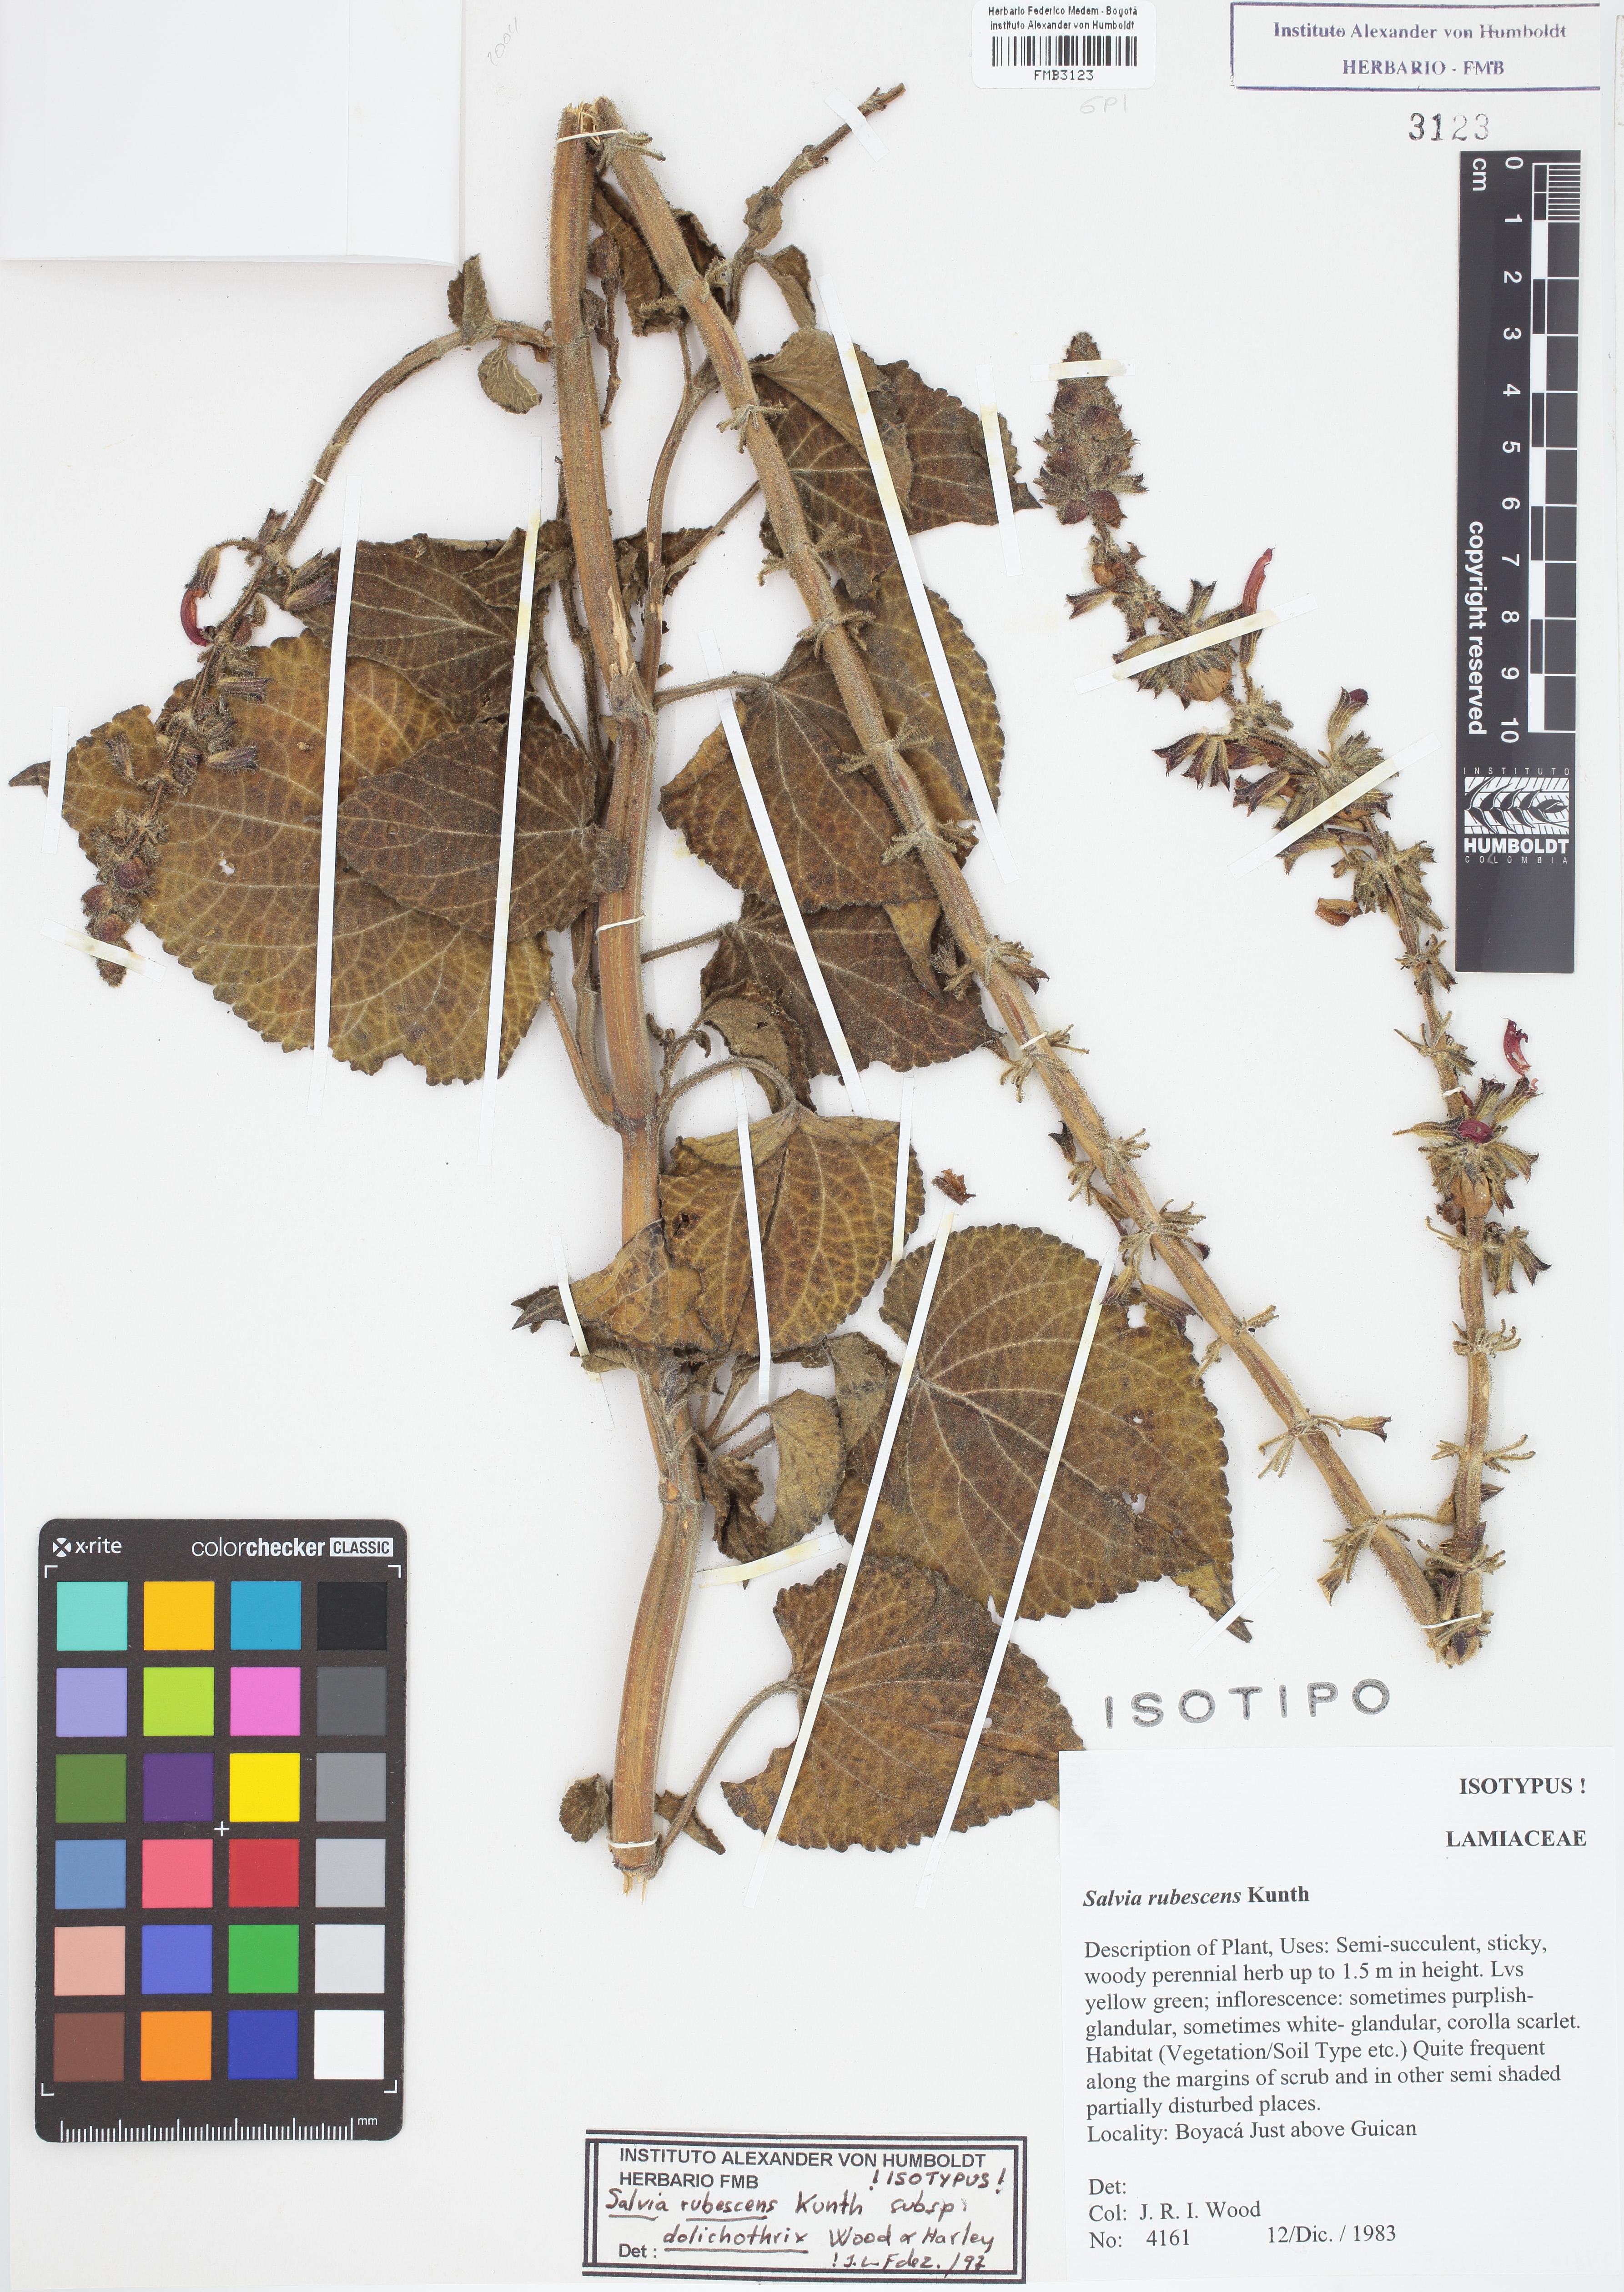 Isotipo de <em>Salvia rubescens</em> subsp. <em>dolichothrix</em>, FMB-3123, Fotografía por Robles A.